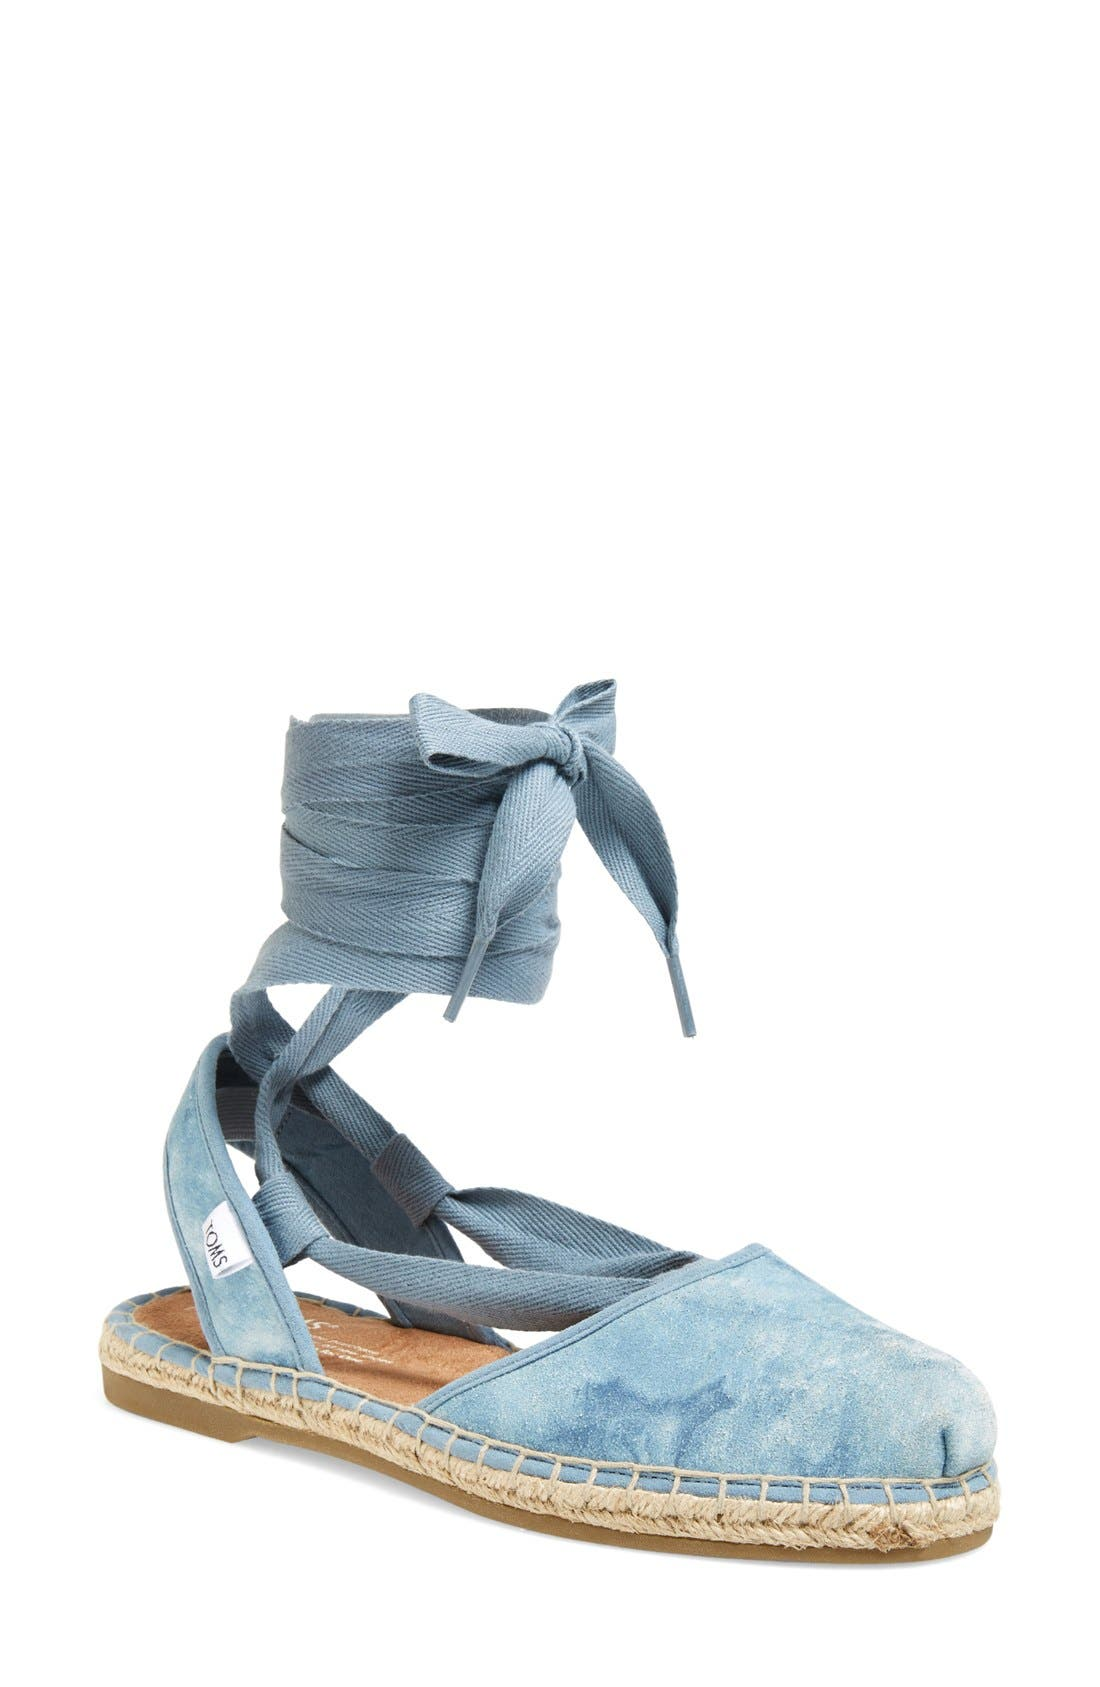 Alternate Image 1 Selected - TOMS 'Bella' Washed Suede Lace-Up Espadrille Sandal (Women)